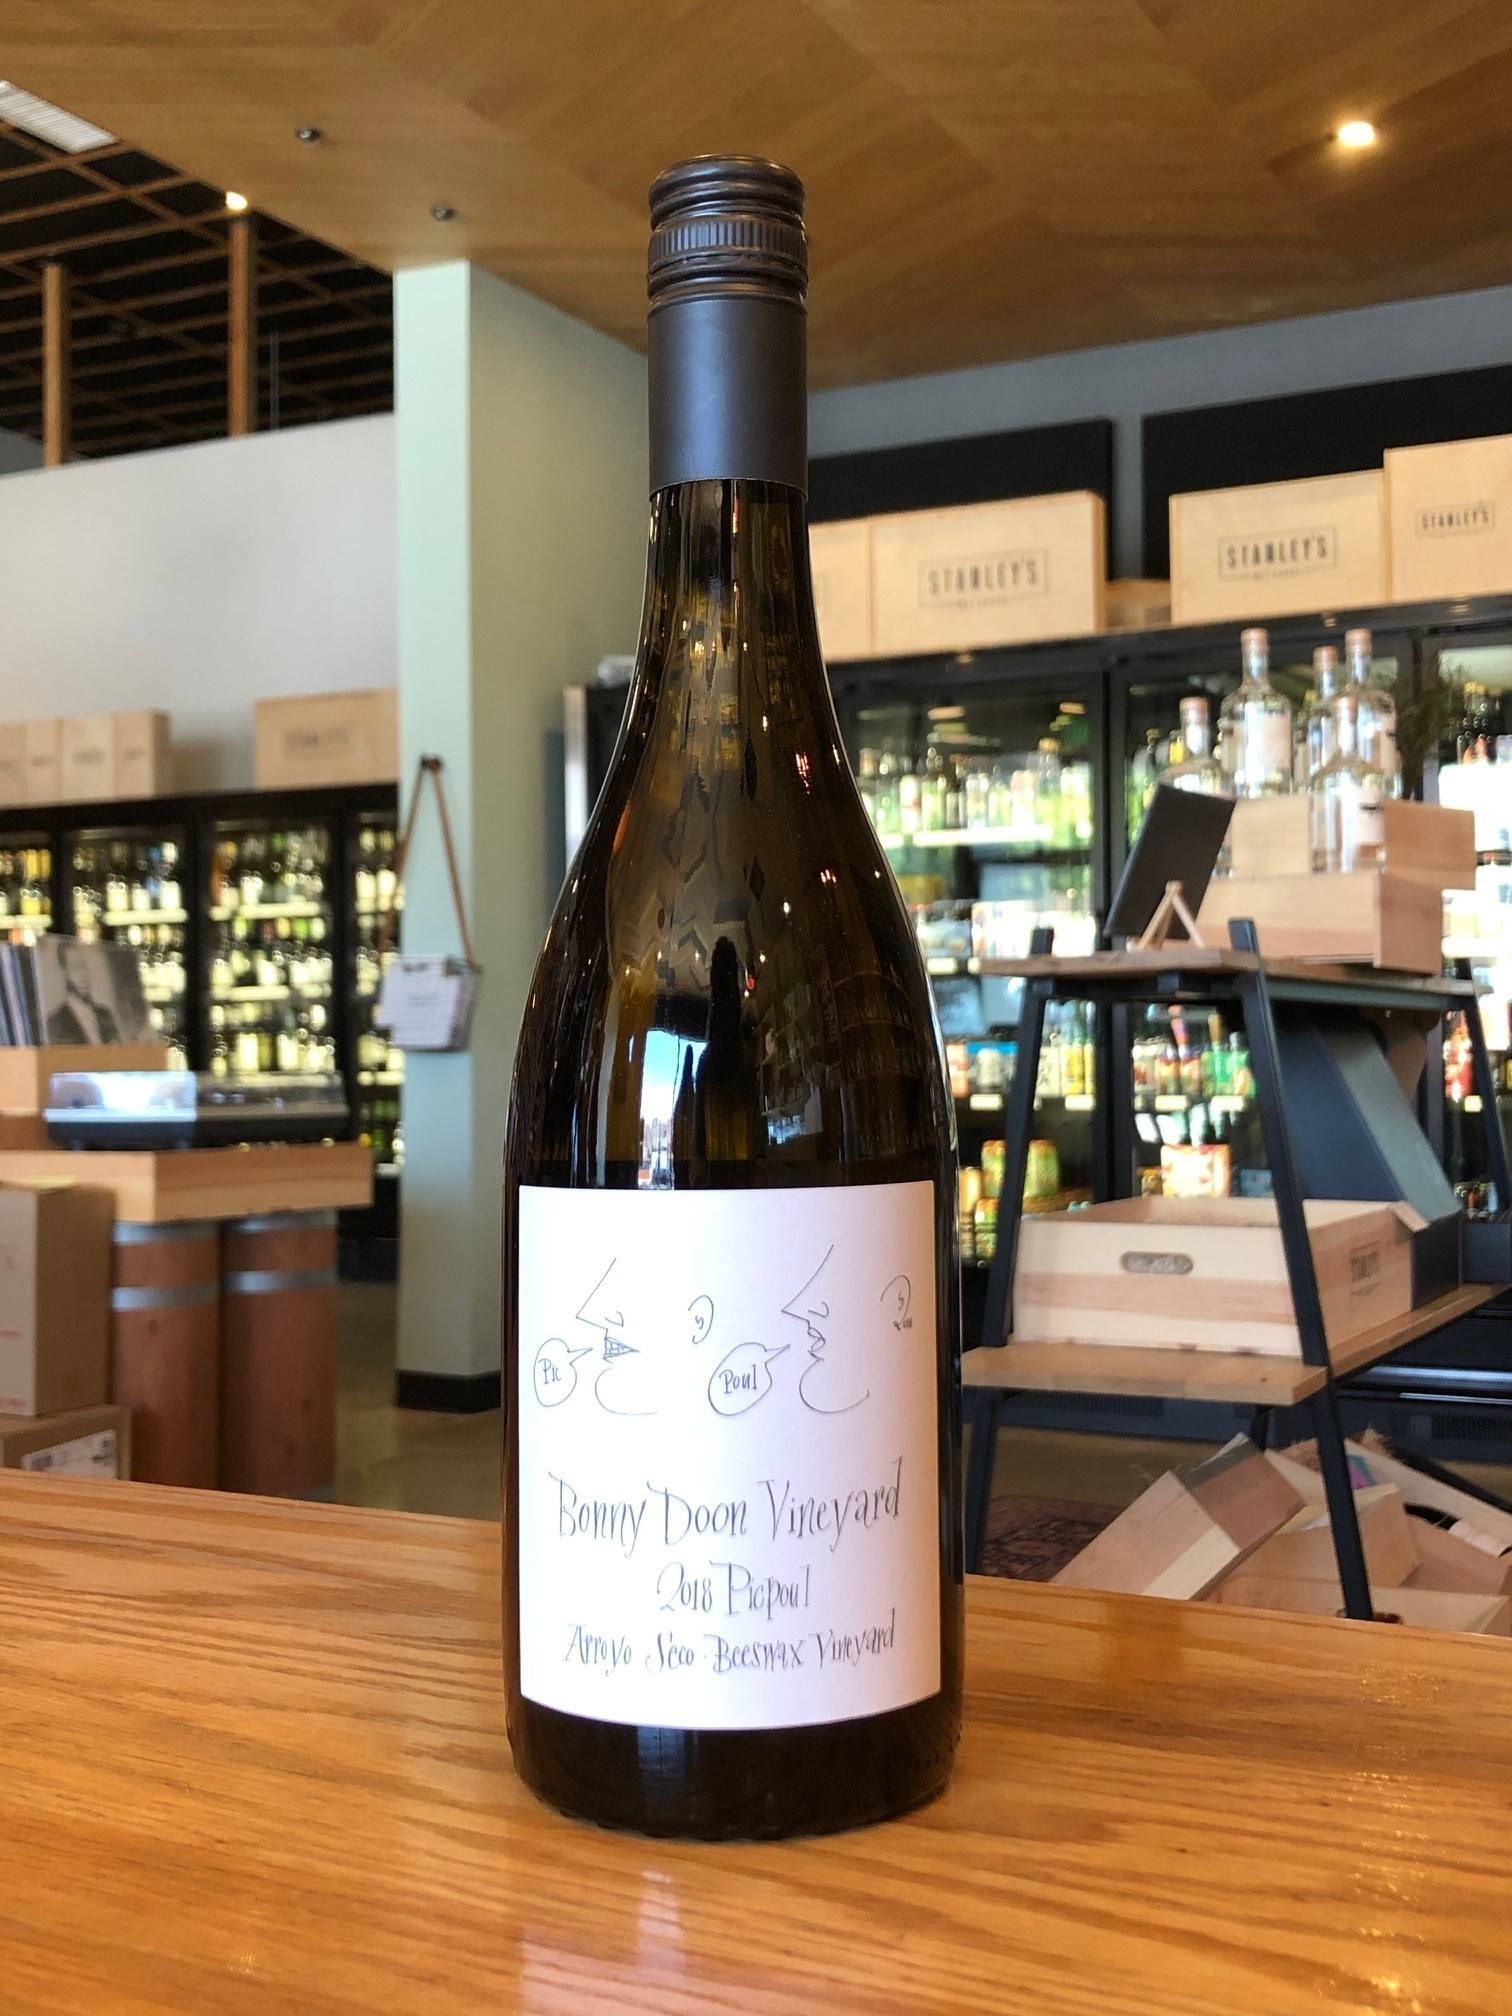 Bonny Doon Vineyard 2018 Bonny Doon Picpoul, Arroyo Seco Beeswax Vineyard 750ml